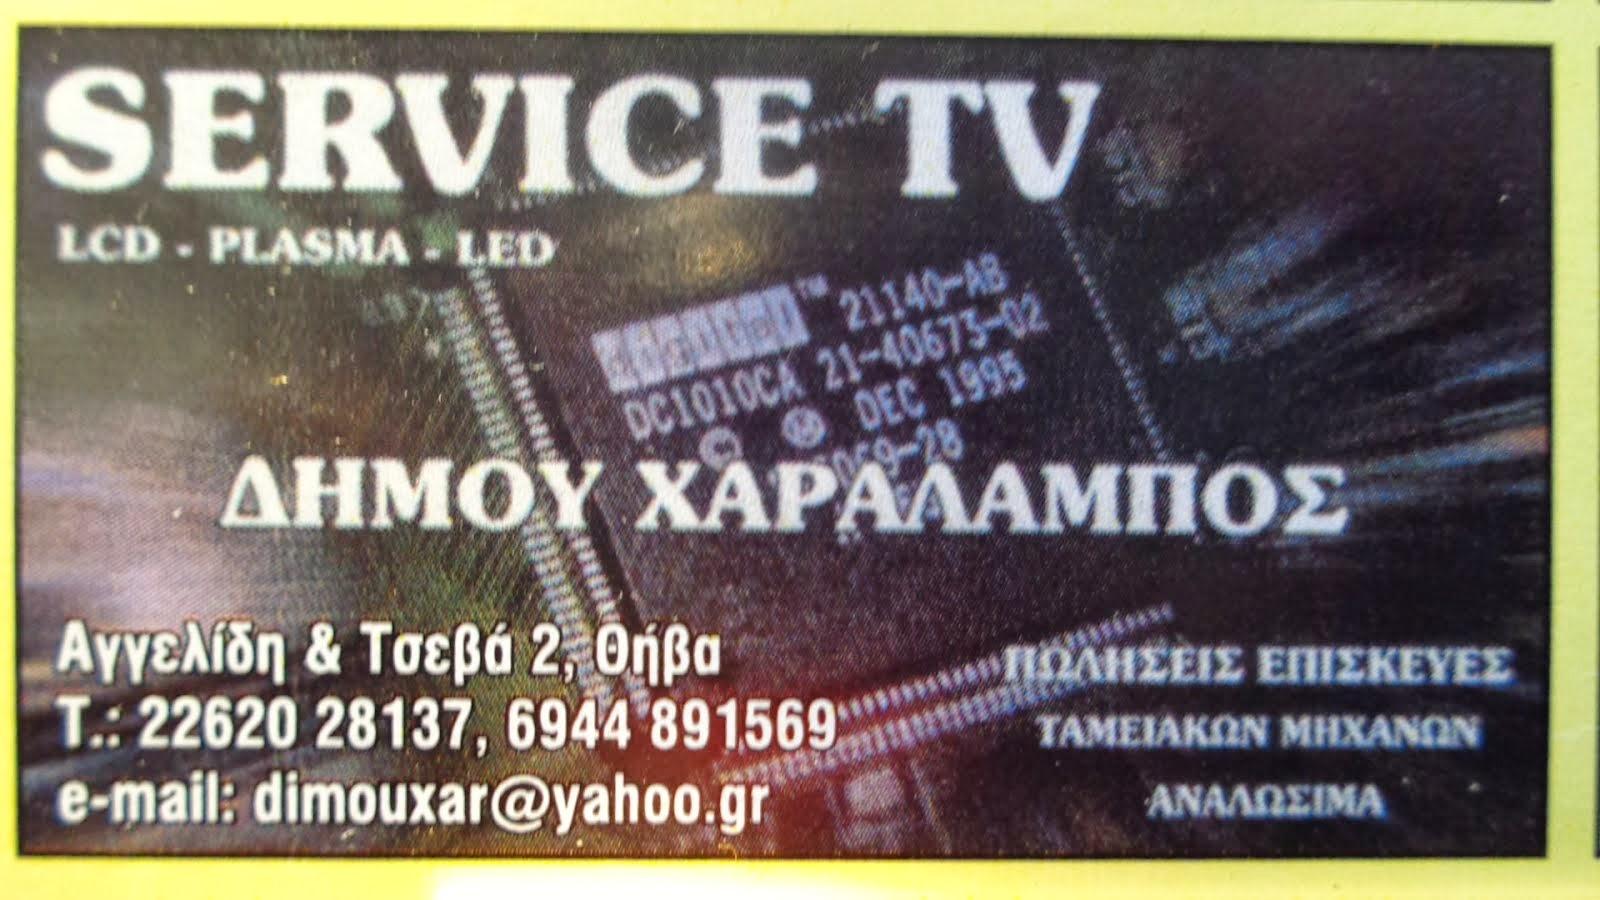 SERVISE TV